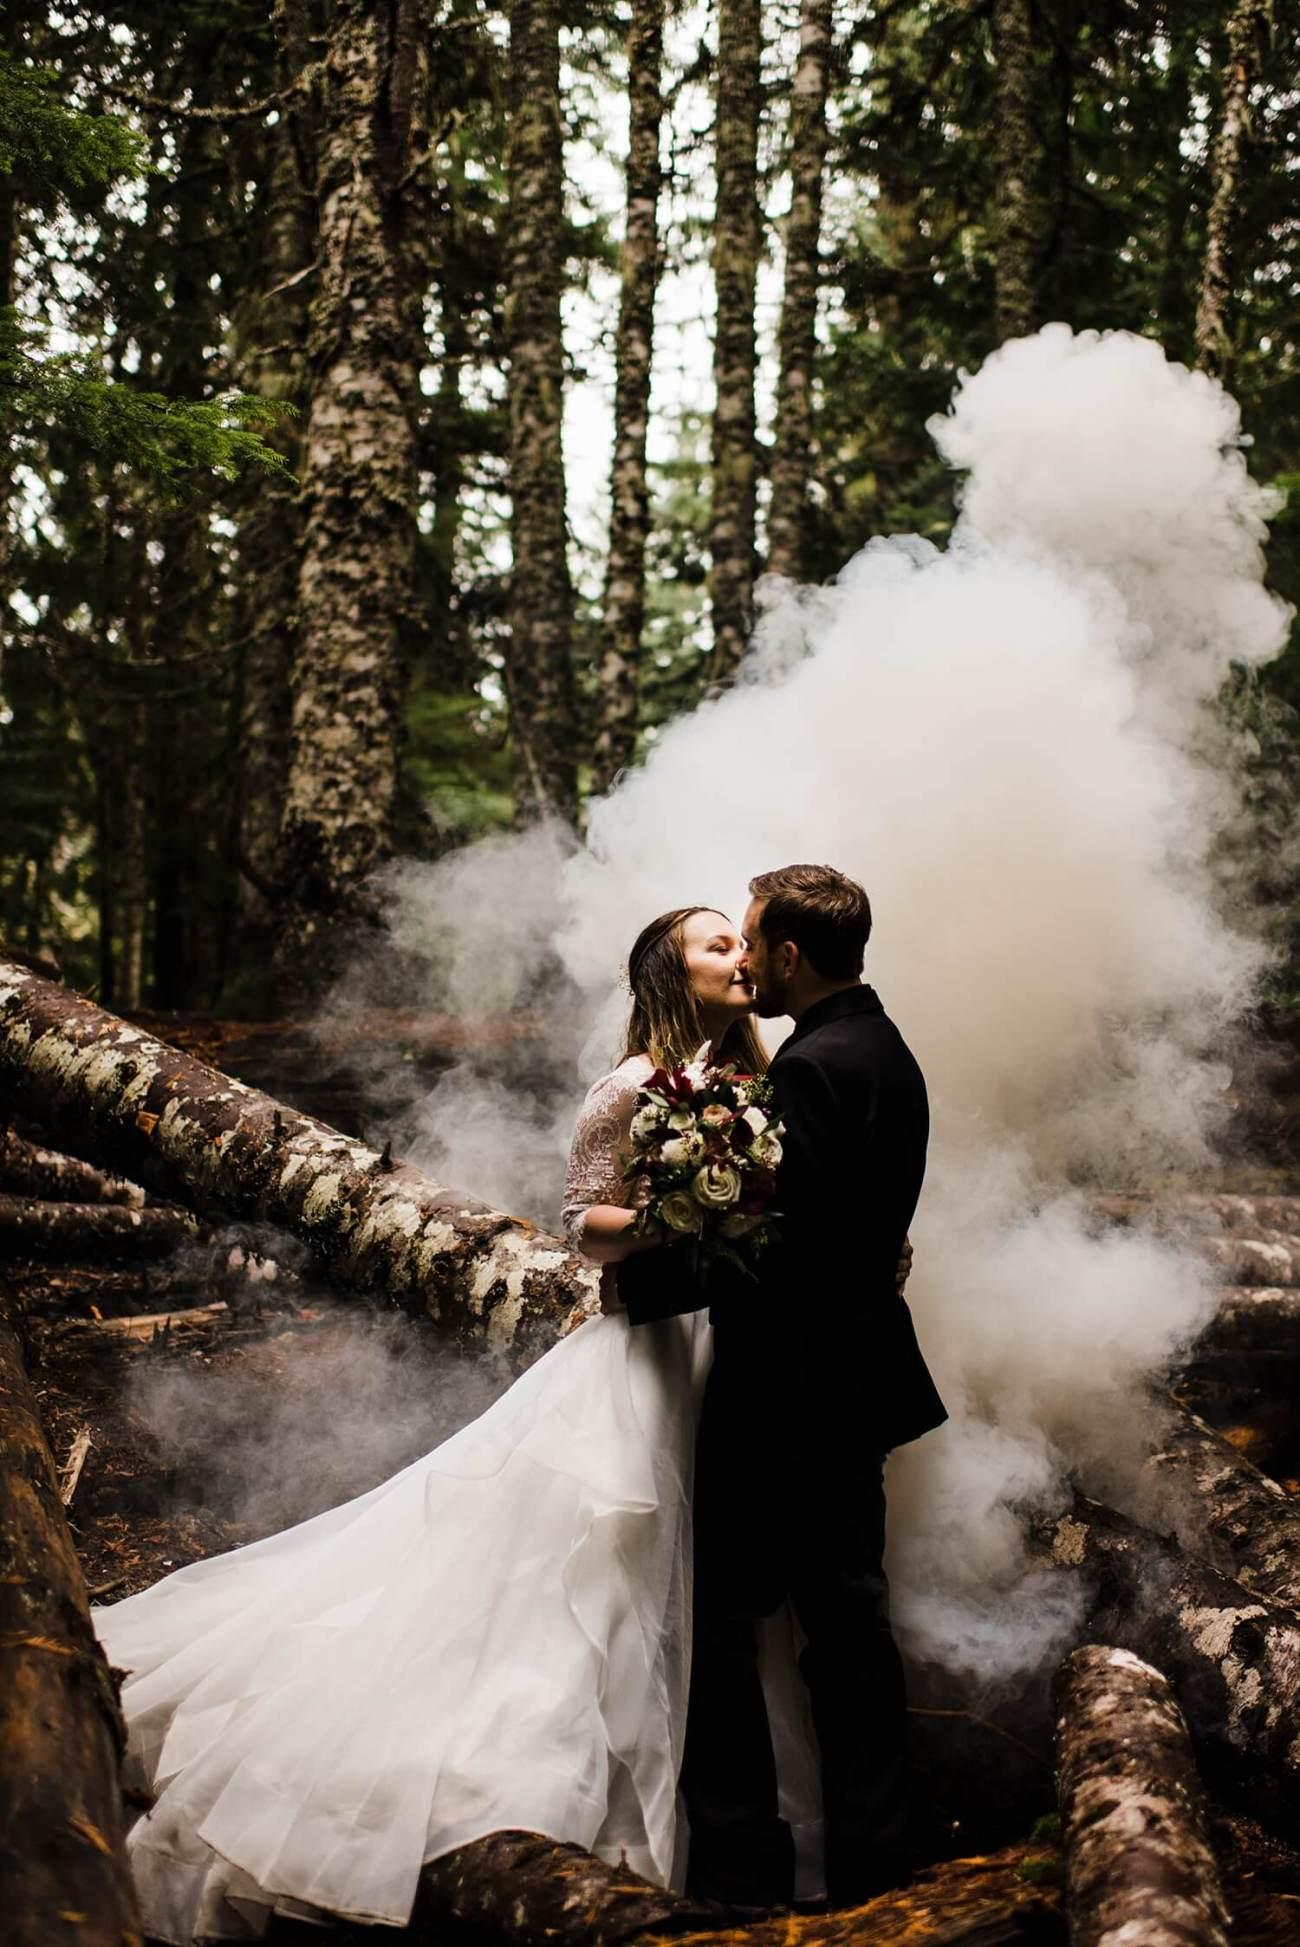 Mount Hood,Mt Hood,adventure elopement,adventure elopement photographer,mountain elopement,mt hood elopement,oregon elopement,oregon wedding,pacific northwest wedding,sam starns,